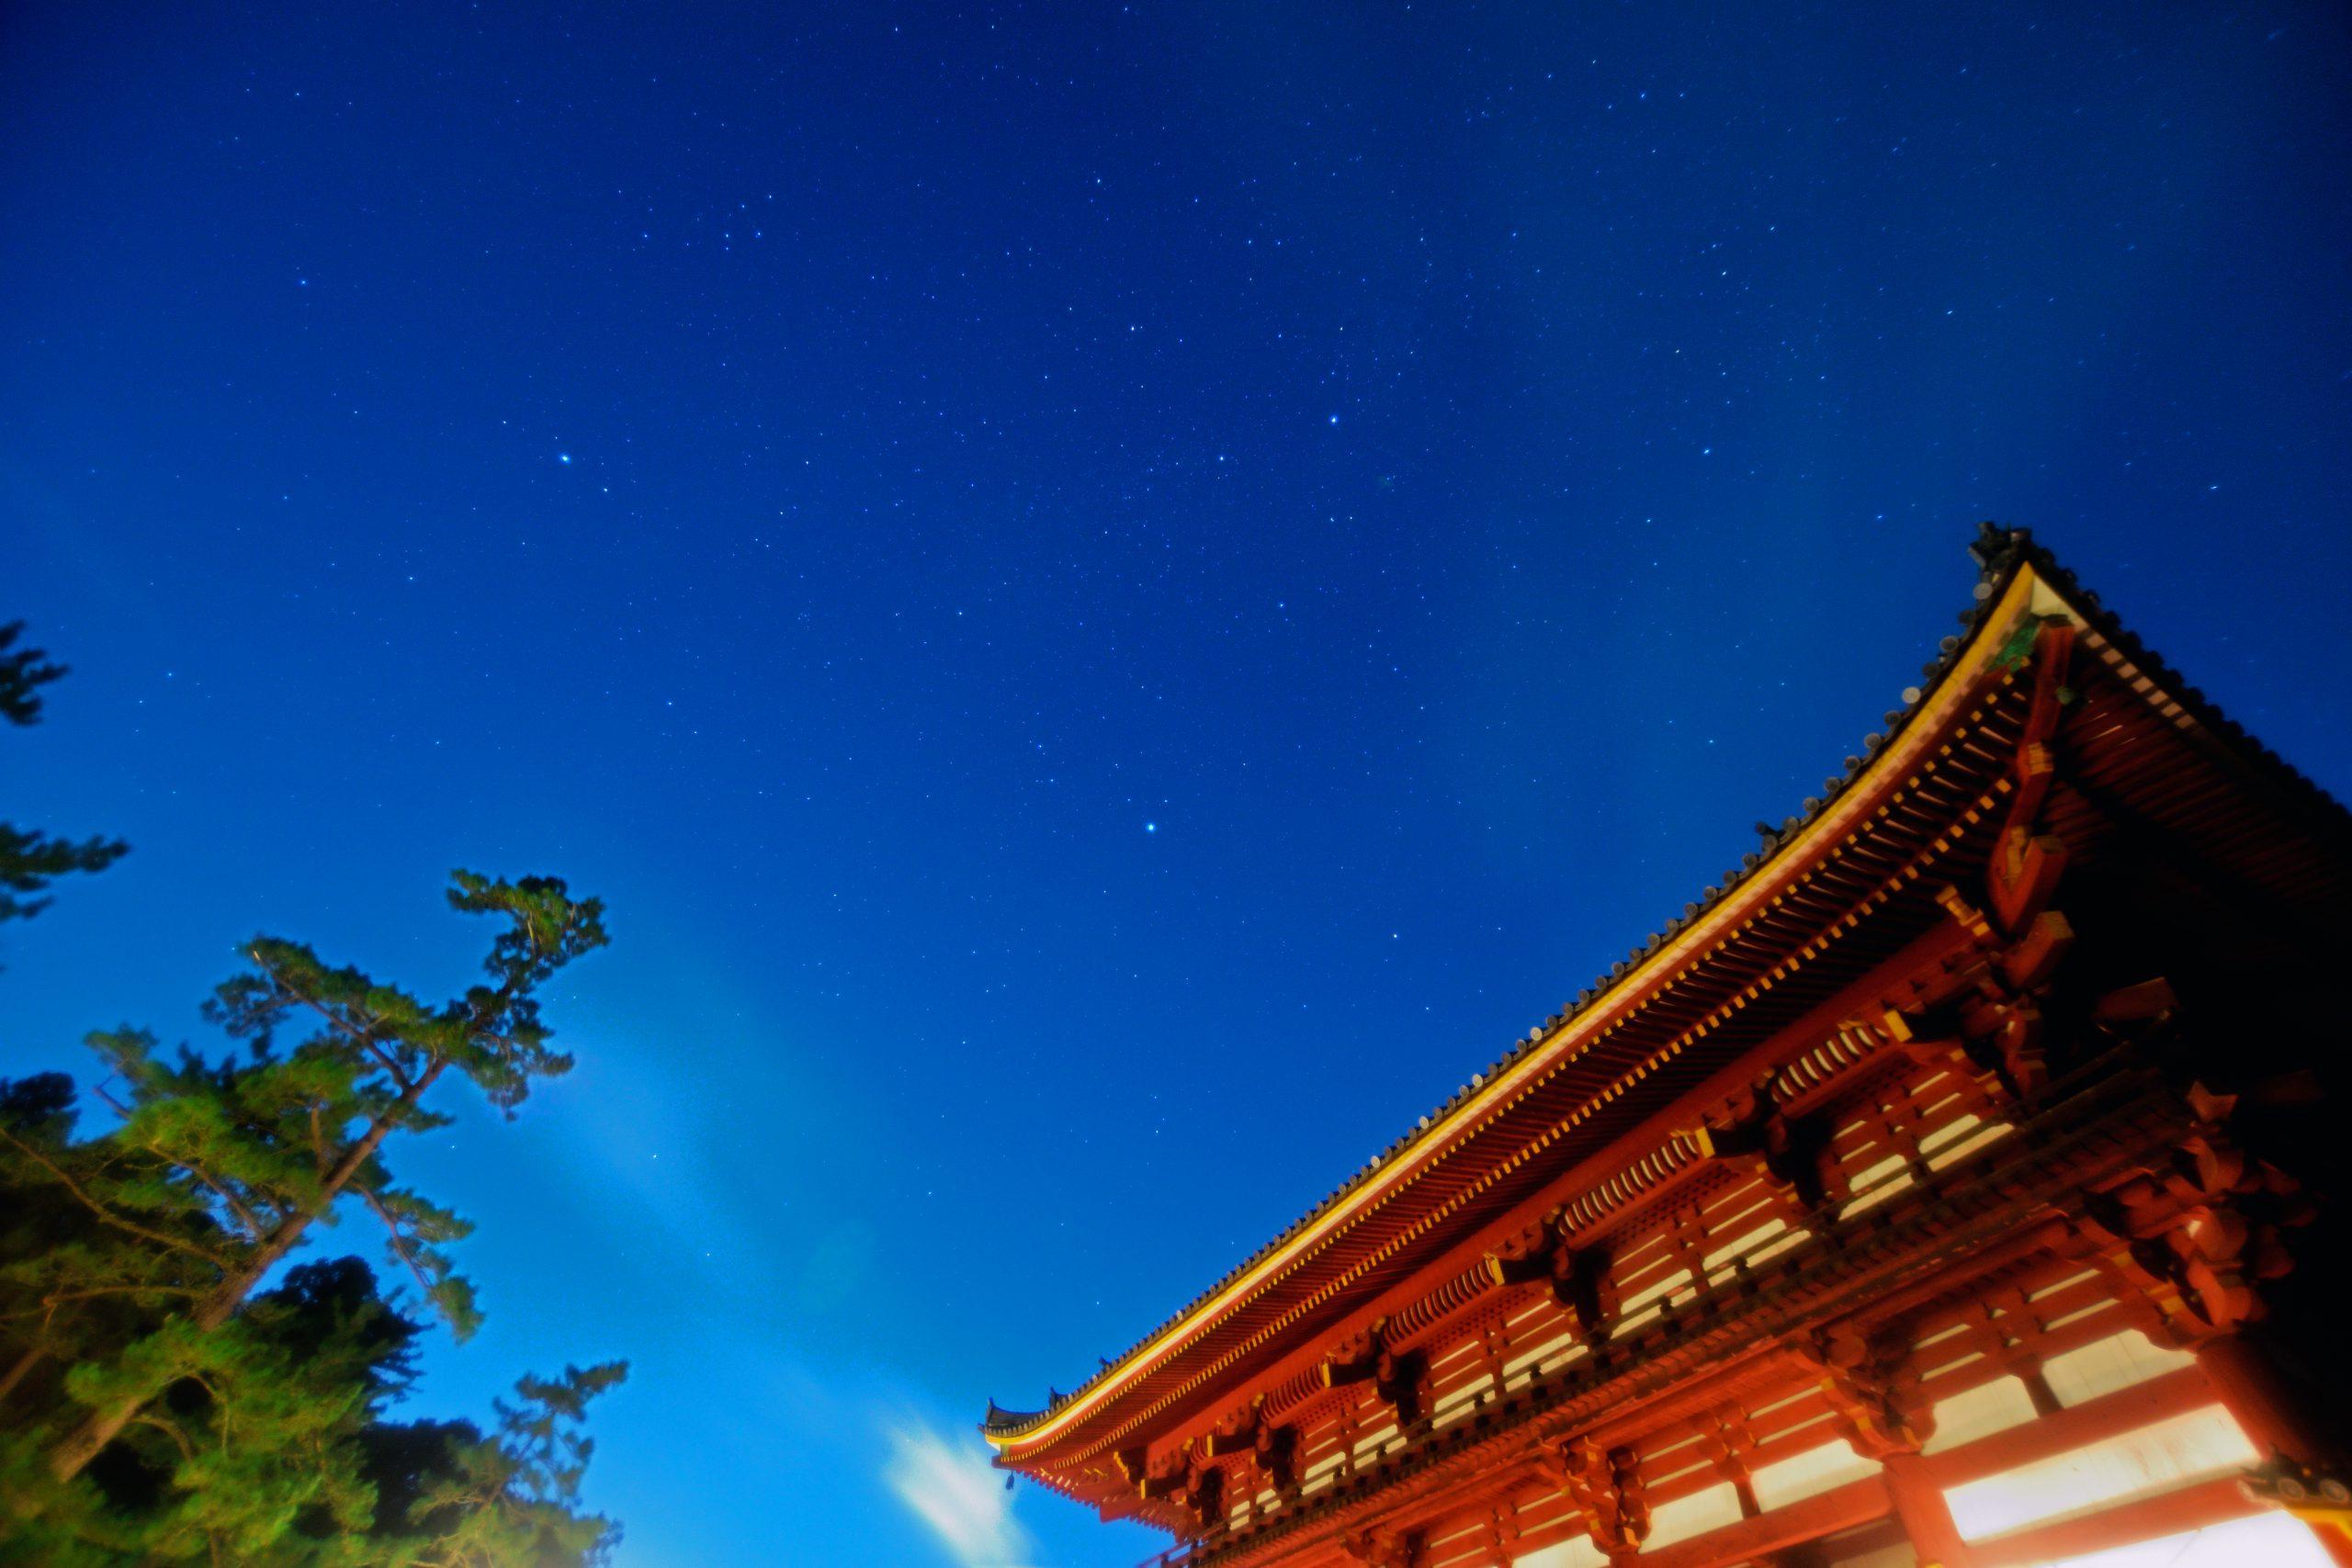 東大寺中門と夏の大三角